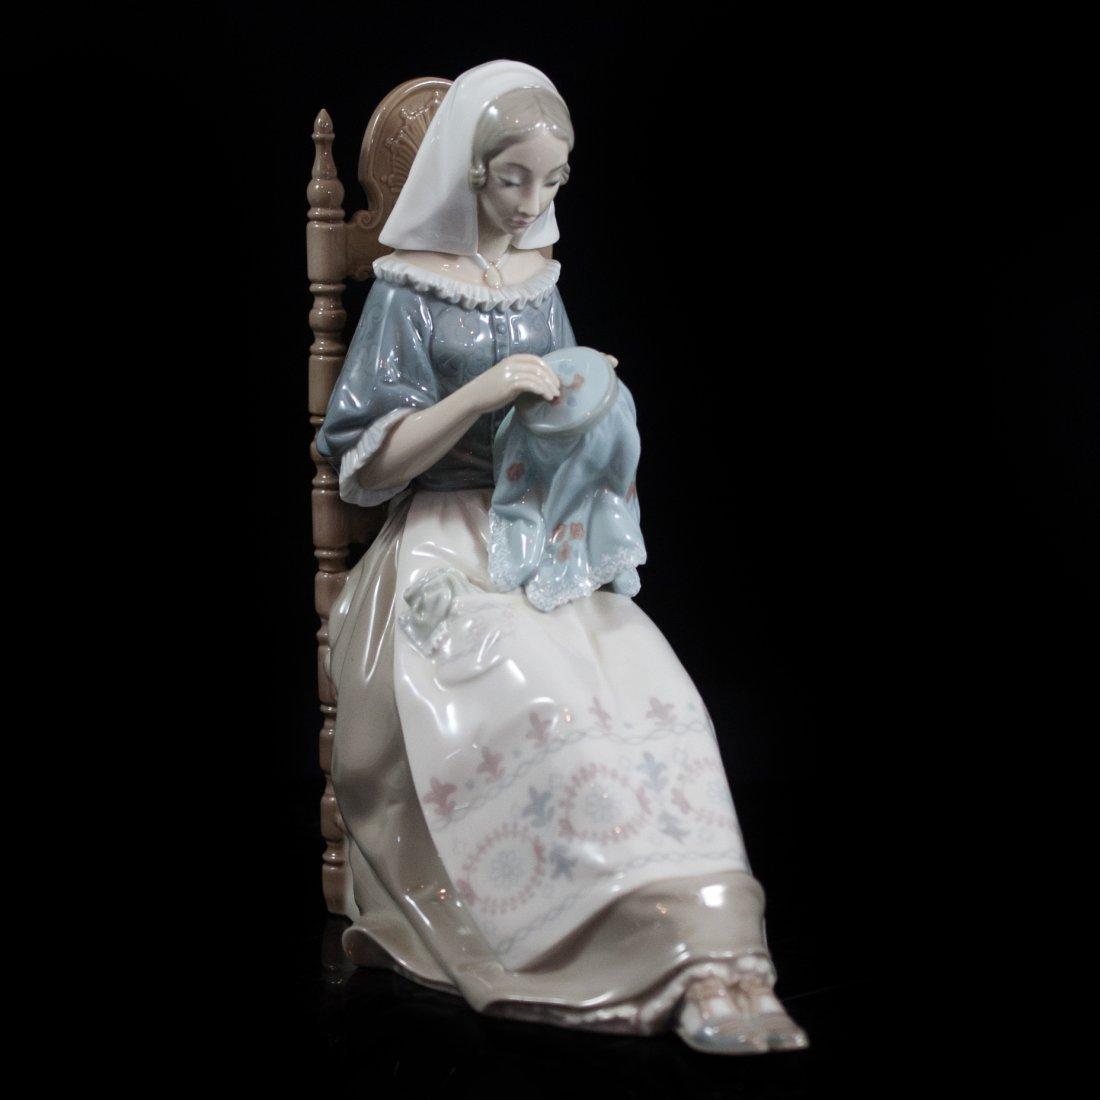 Lladro Porcelain Figurine of Woman Knitting